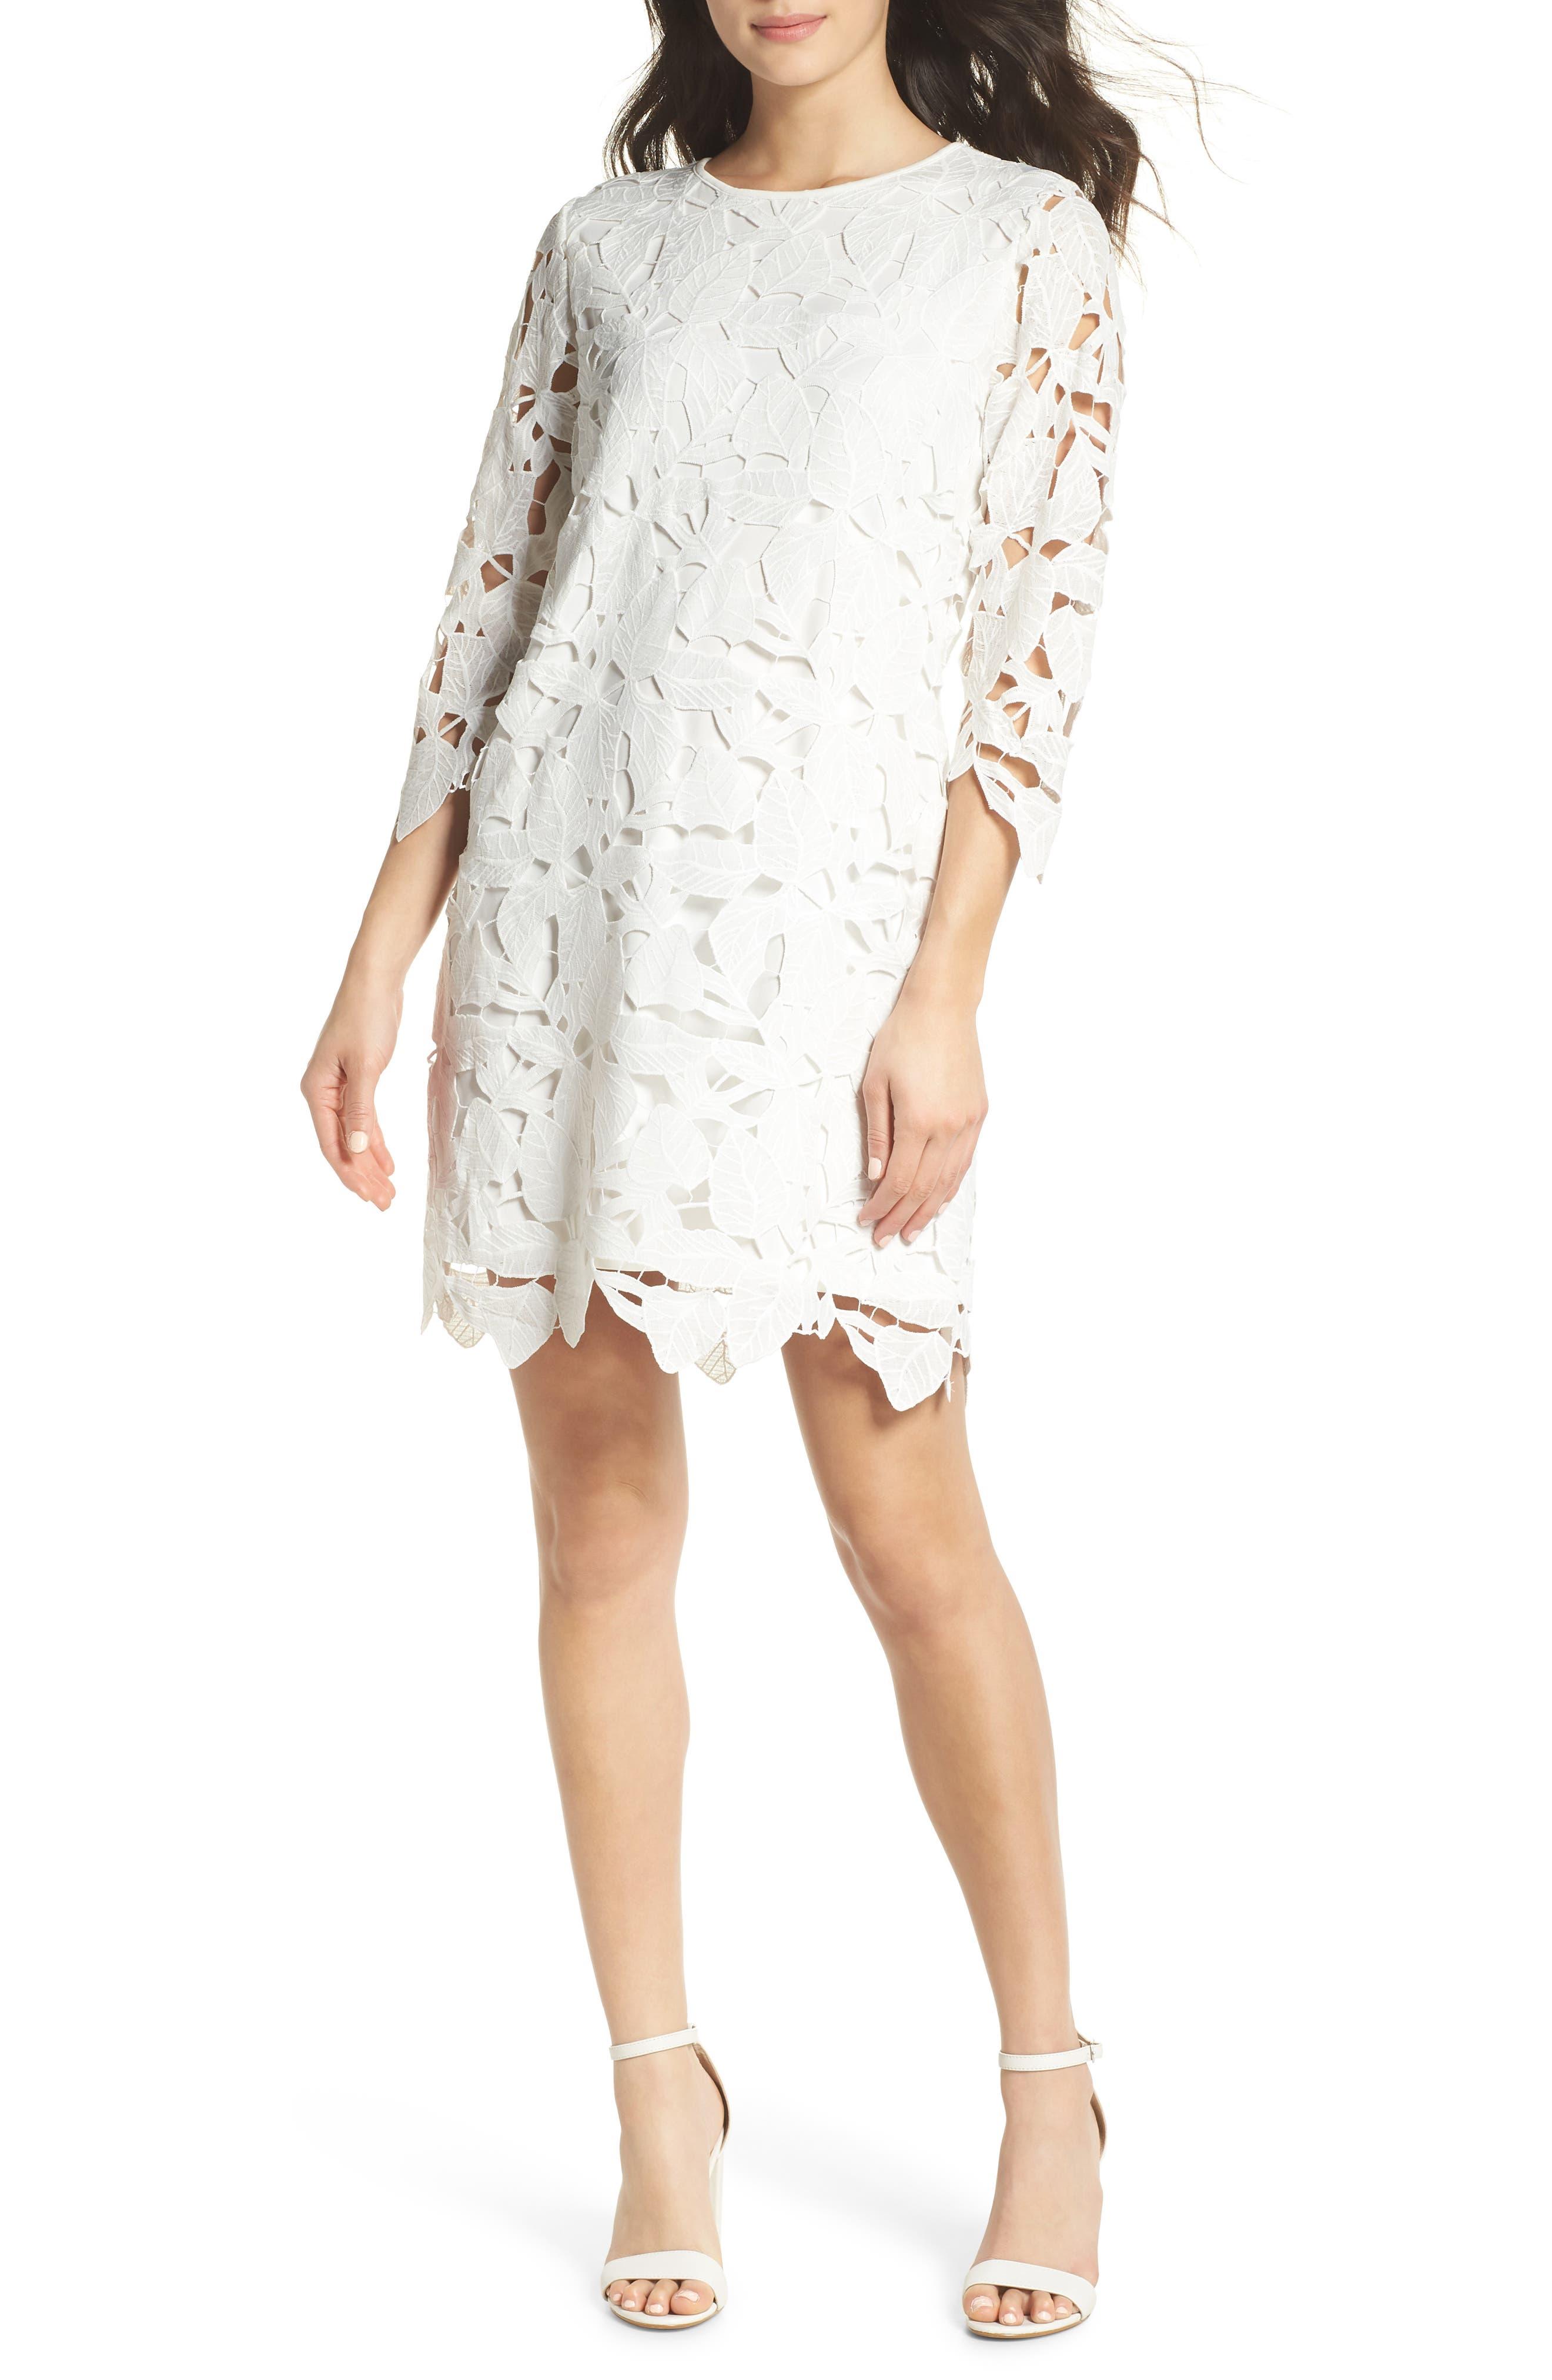 Felicity & Coco Skye Lace Shift Dress